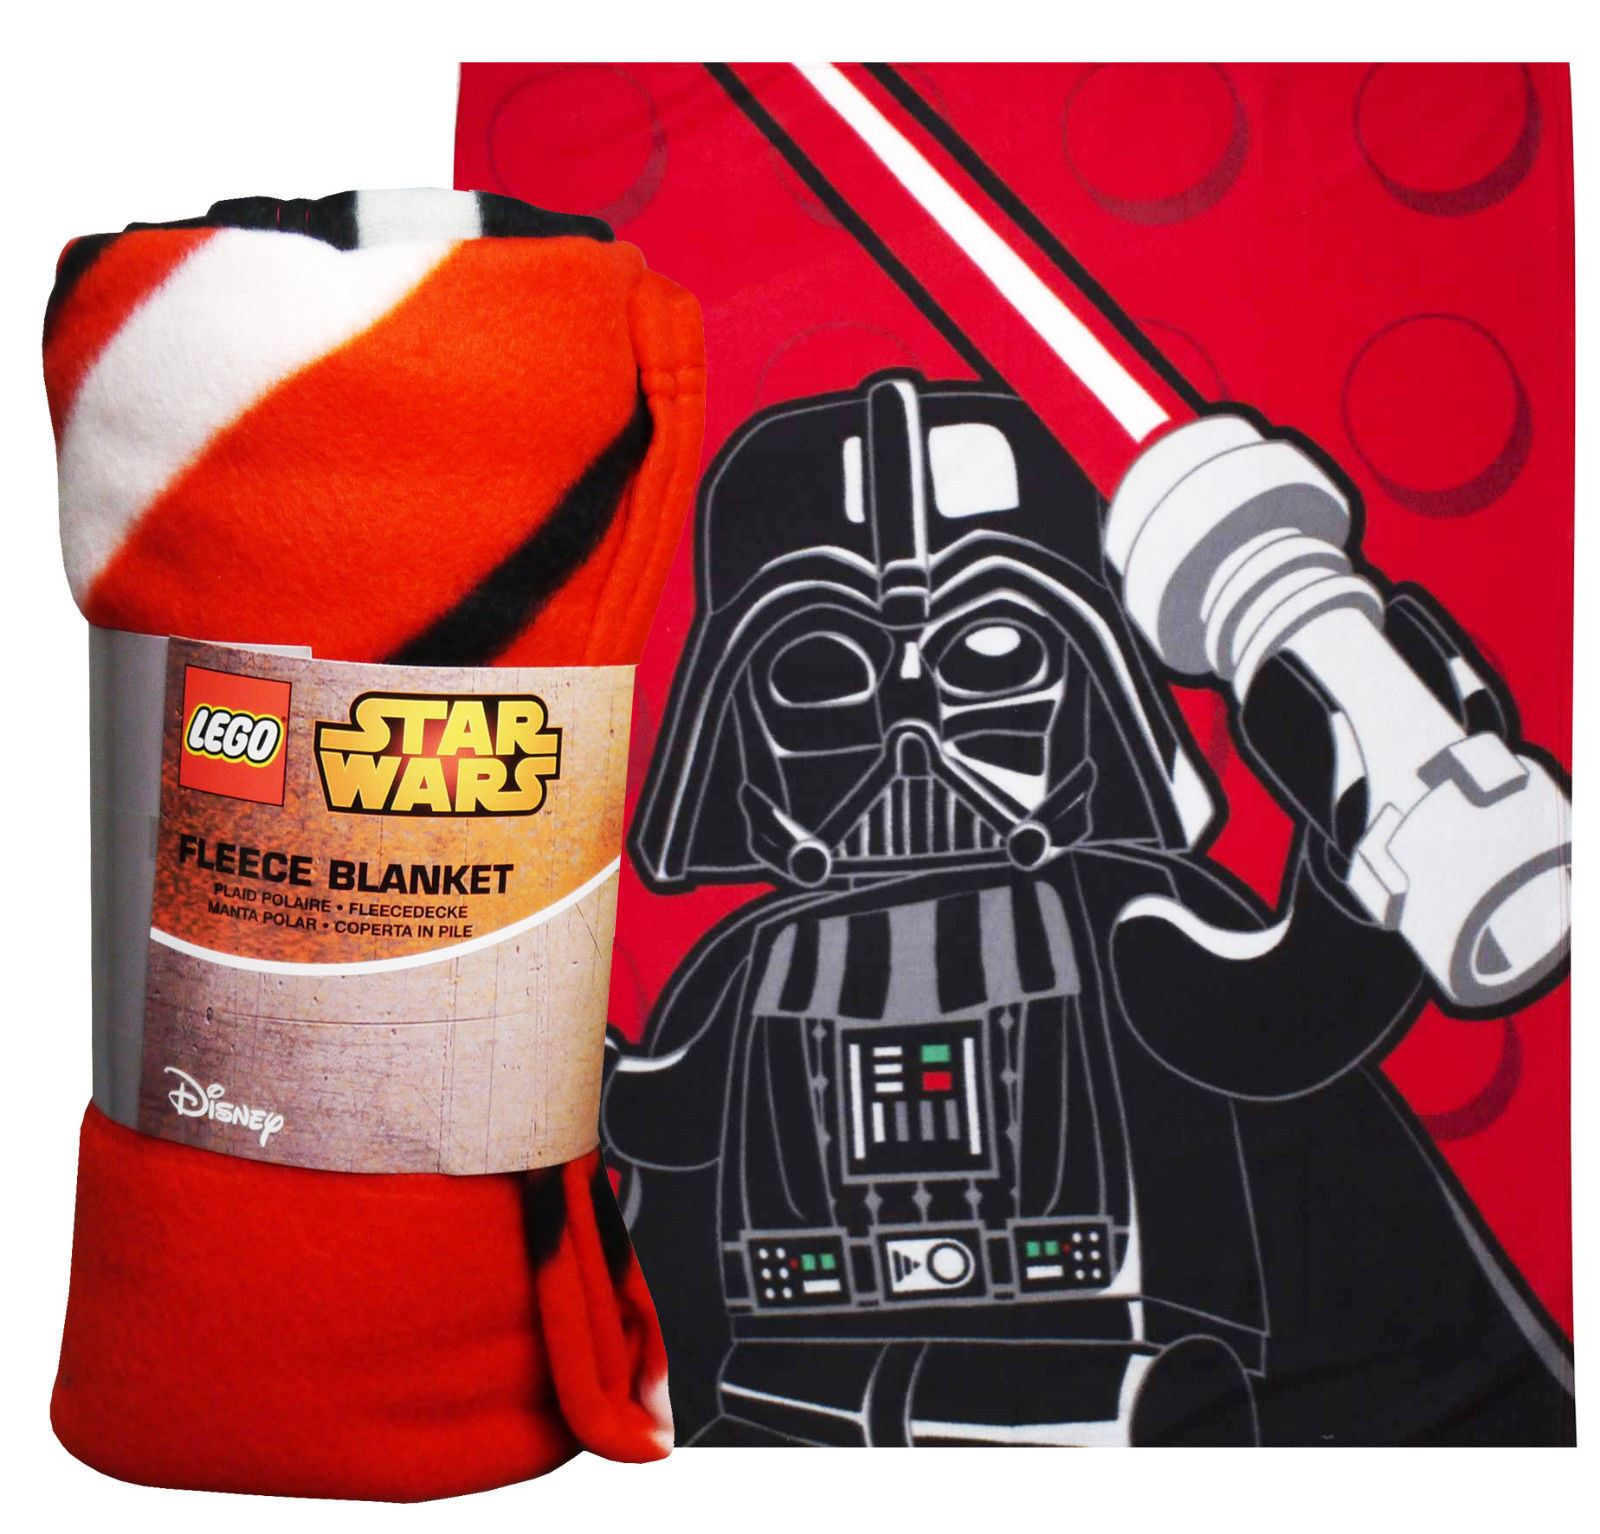 Official-Licensed-Fleece-Blanket-Bed-Throw-100-x-150cm-Fortnite-Disney-Lego-DC thumbnail 32